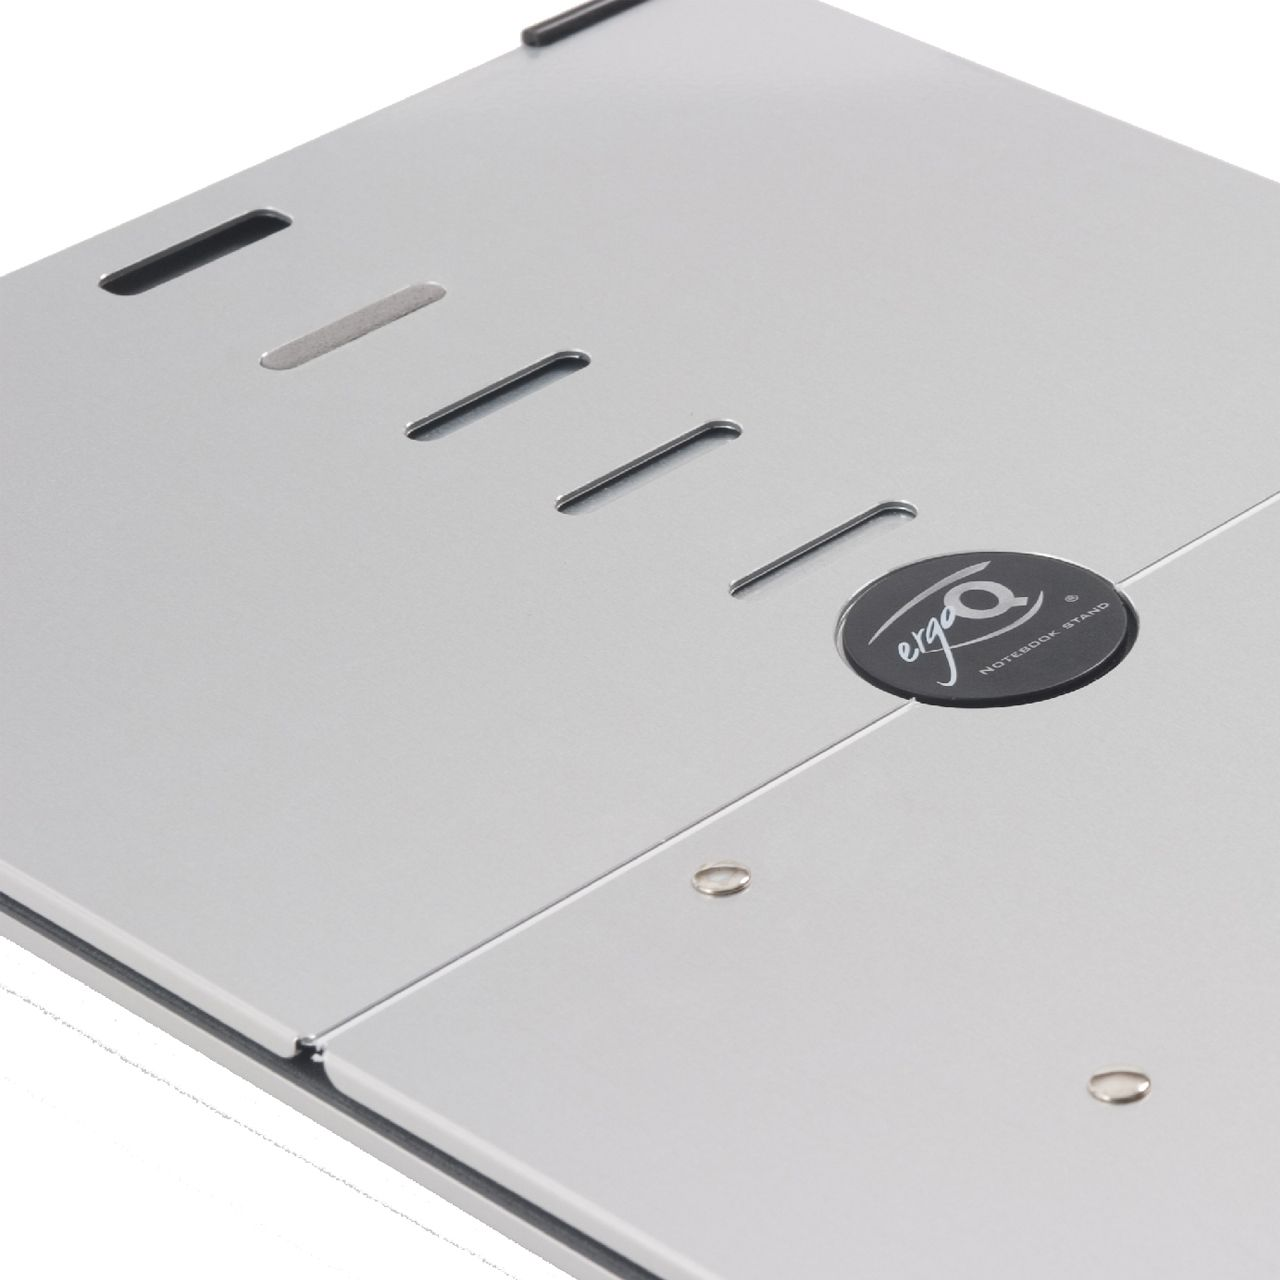 Ergo Q 220 laptophouder Dichtgeklapt